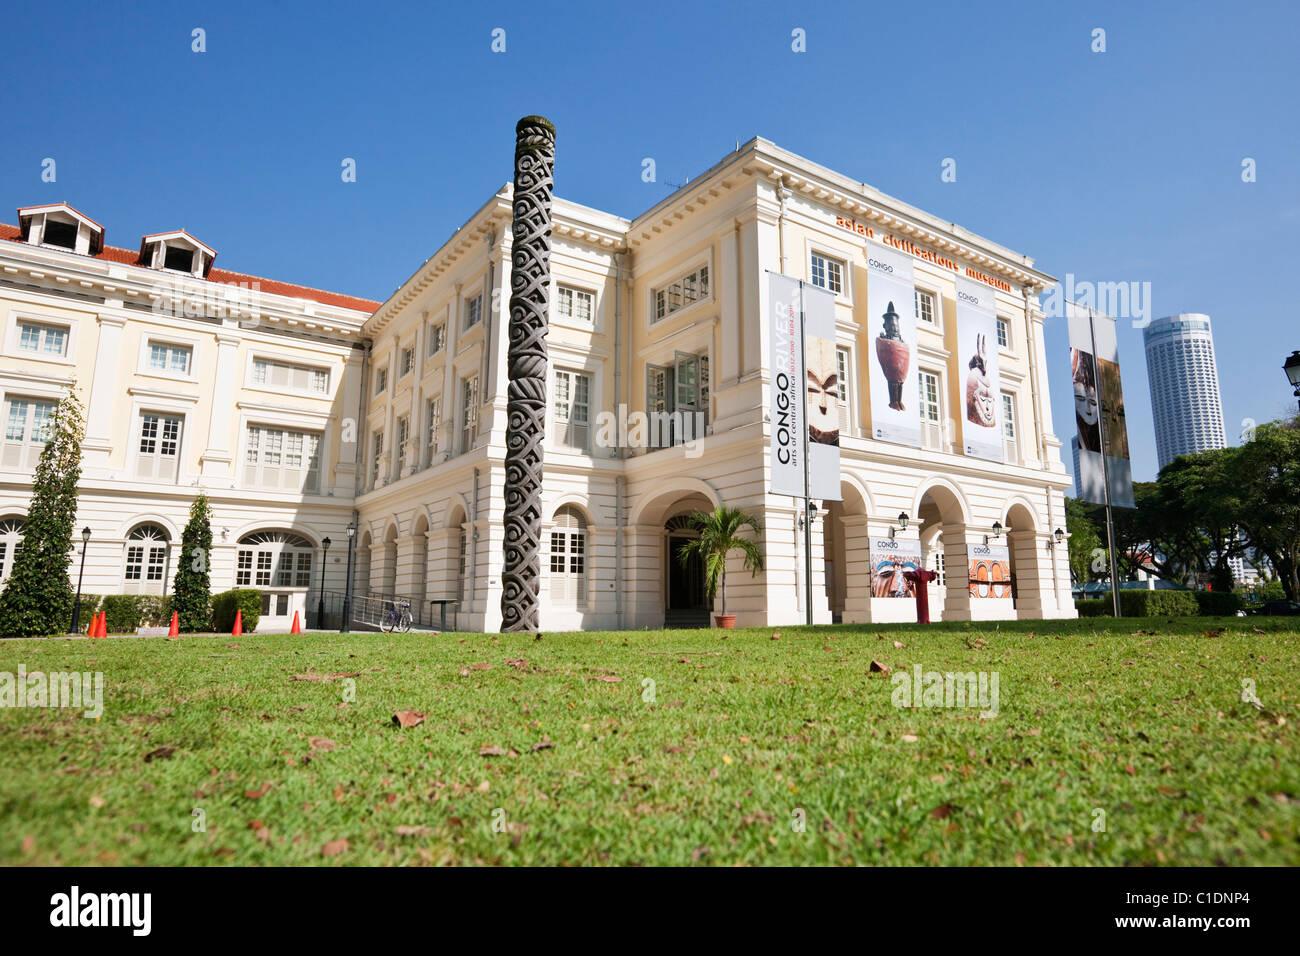 Asian Civilisations Museum at Raffles Place, Singapore - Stock Image